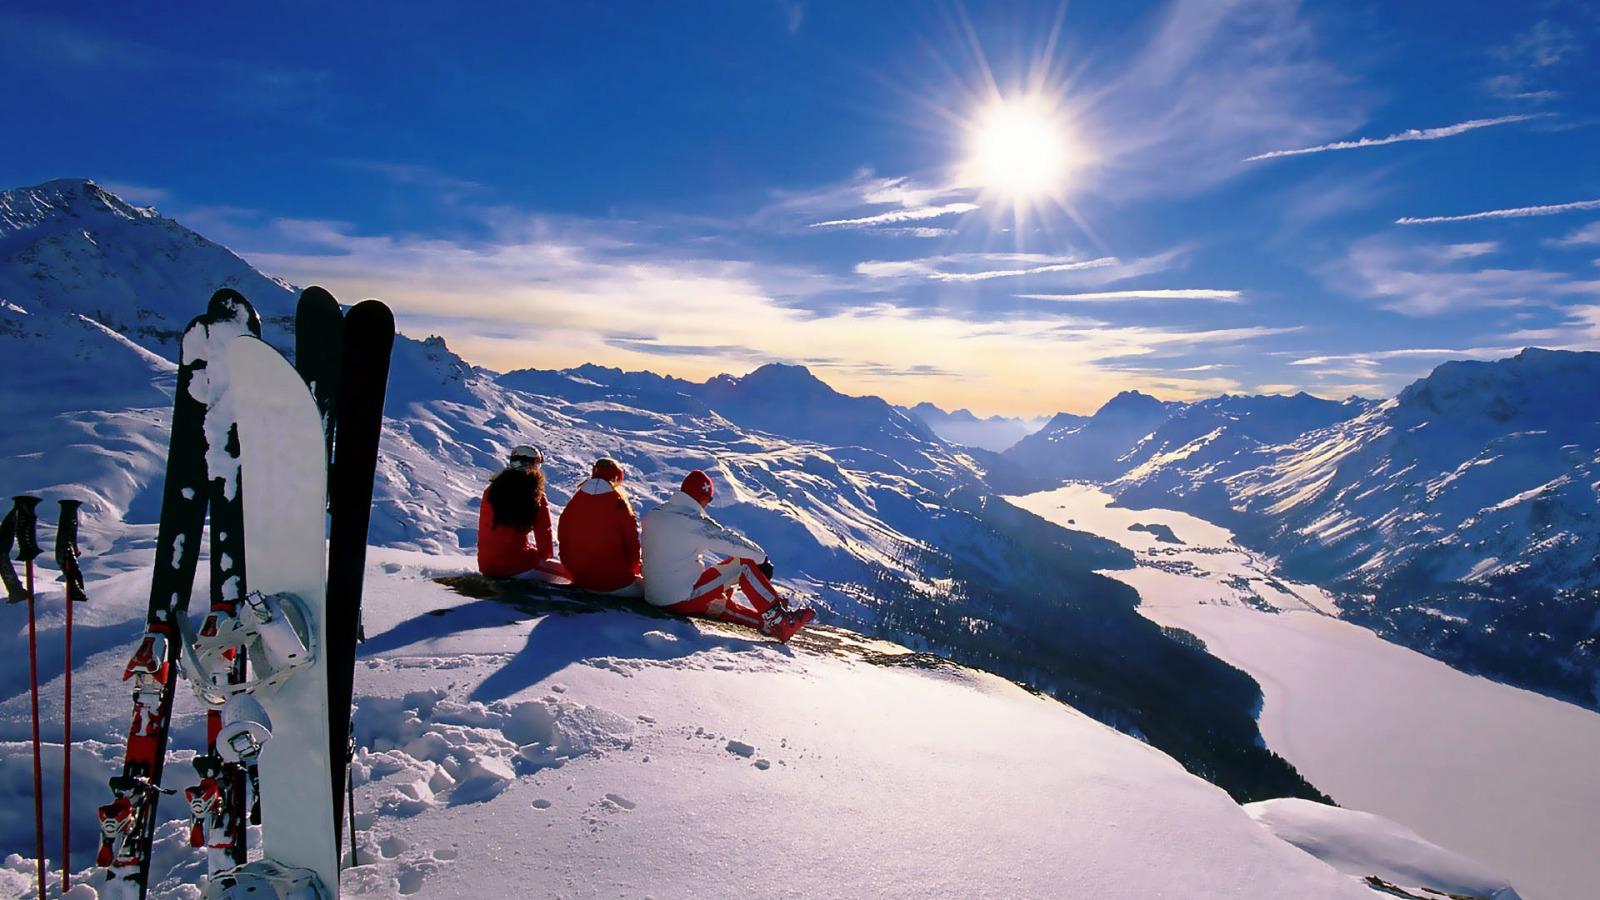 горы снег зима обои рабочий стол сноуборд лыжи люди пейзаж